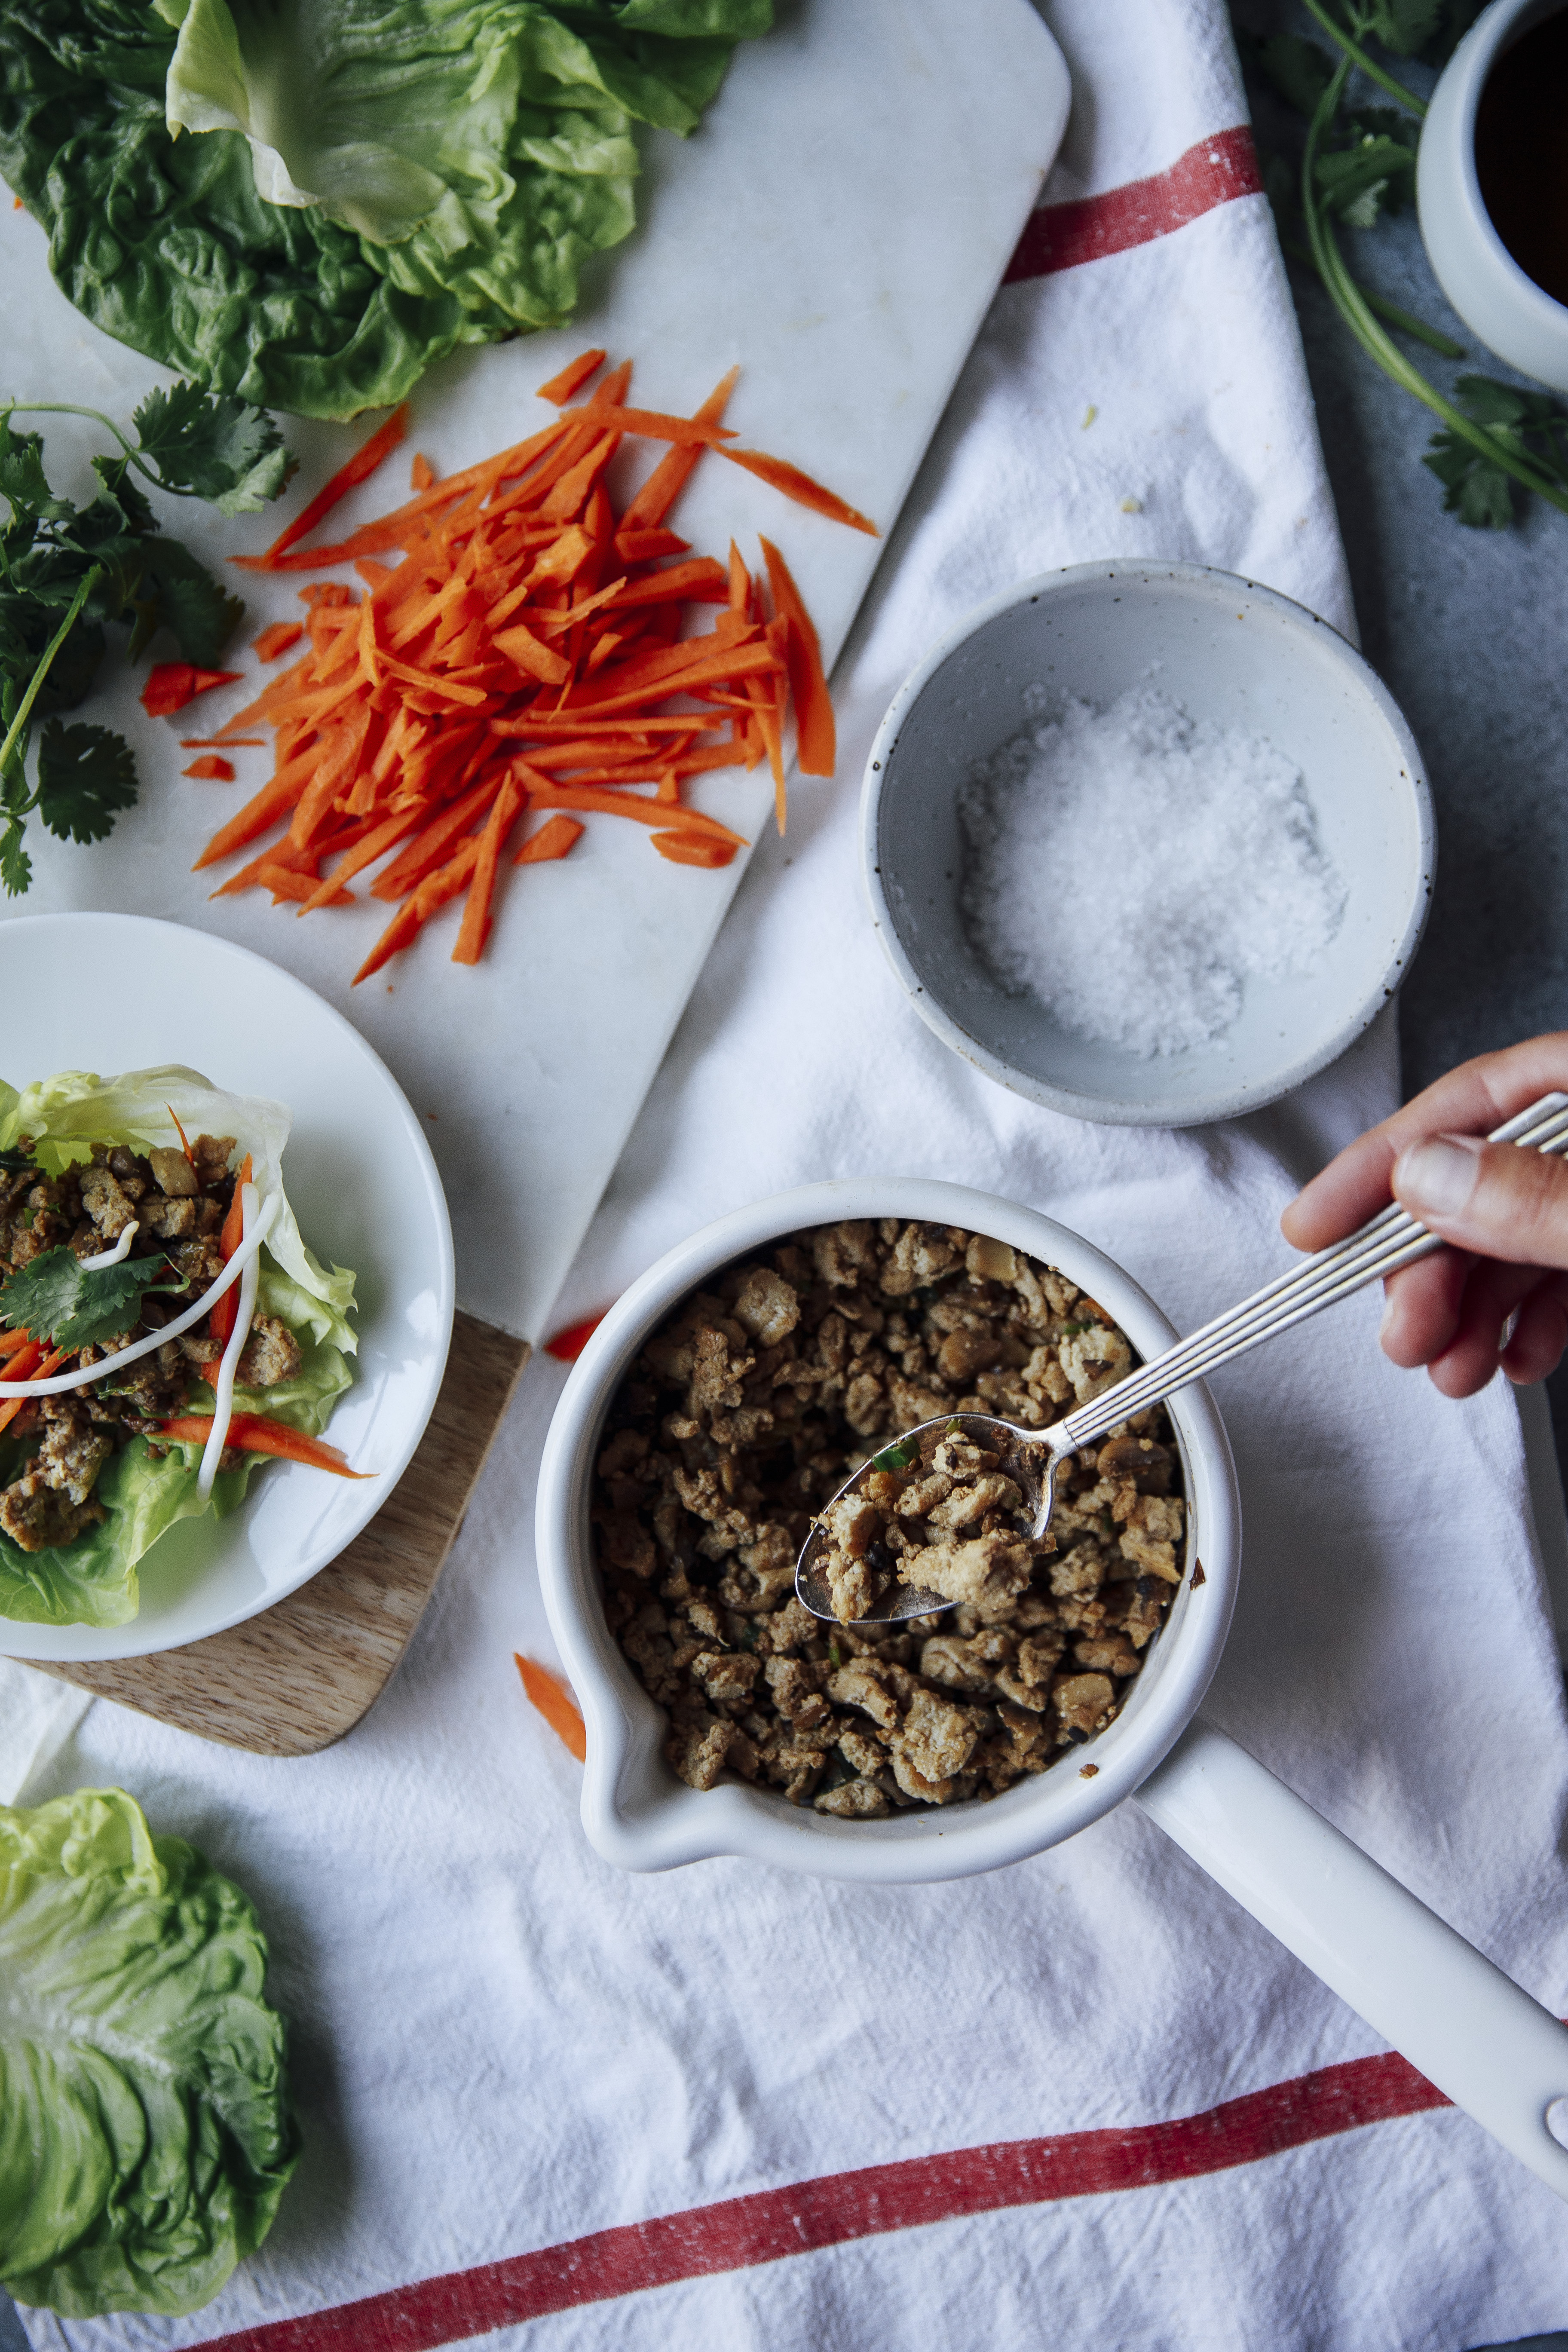 foster farm ground turkey recipes